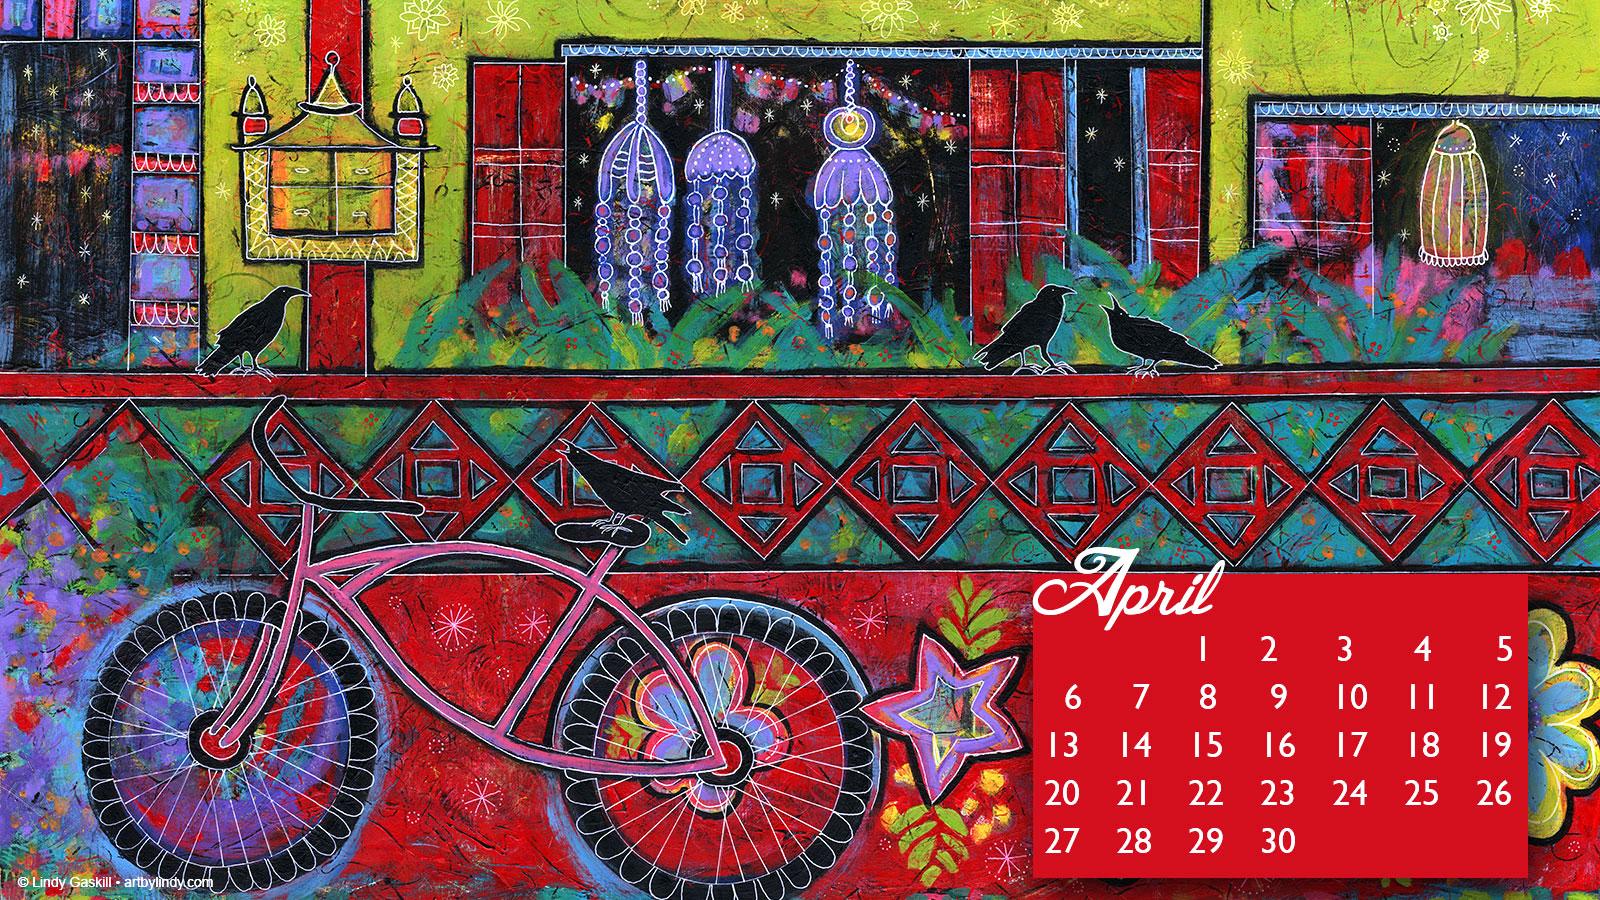 April 2014 desktop wallpaper